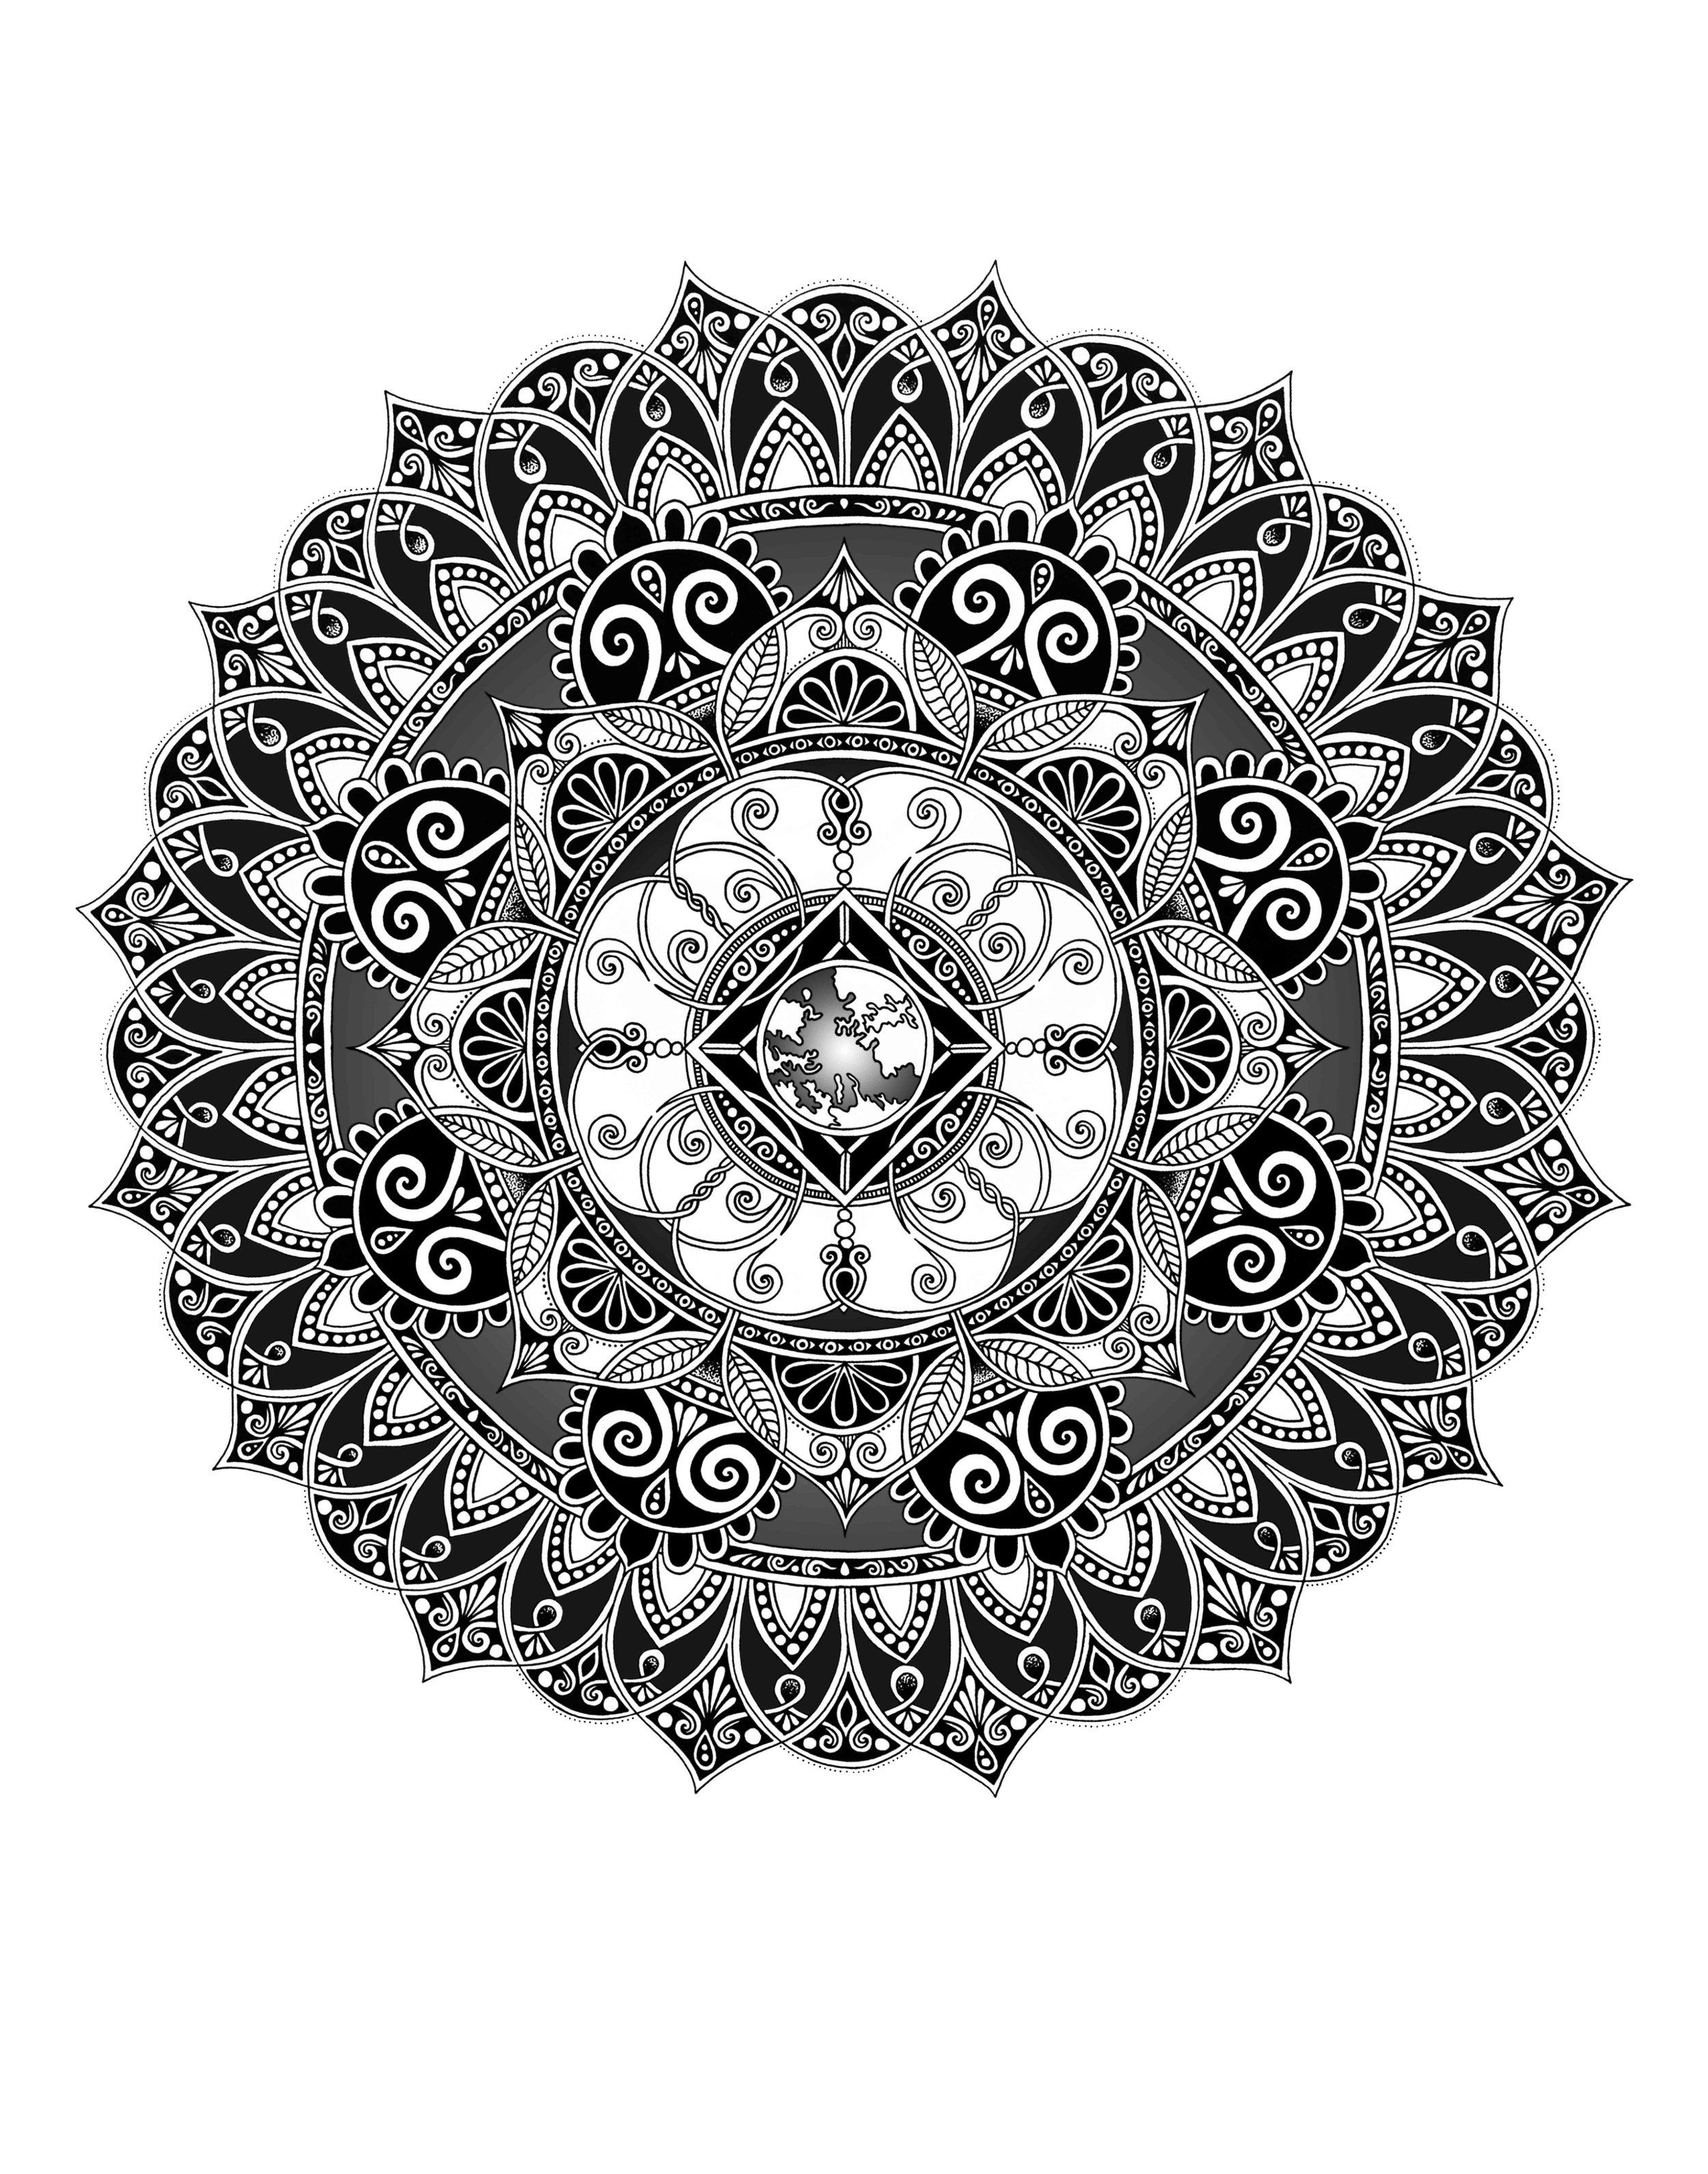 11x14 Coexistence Mandala - fortyonehundred copy.jpg